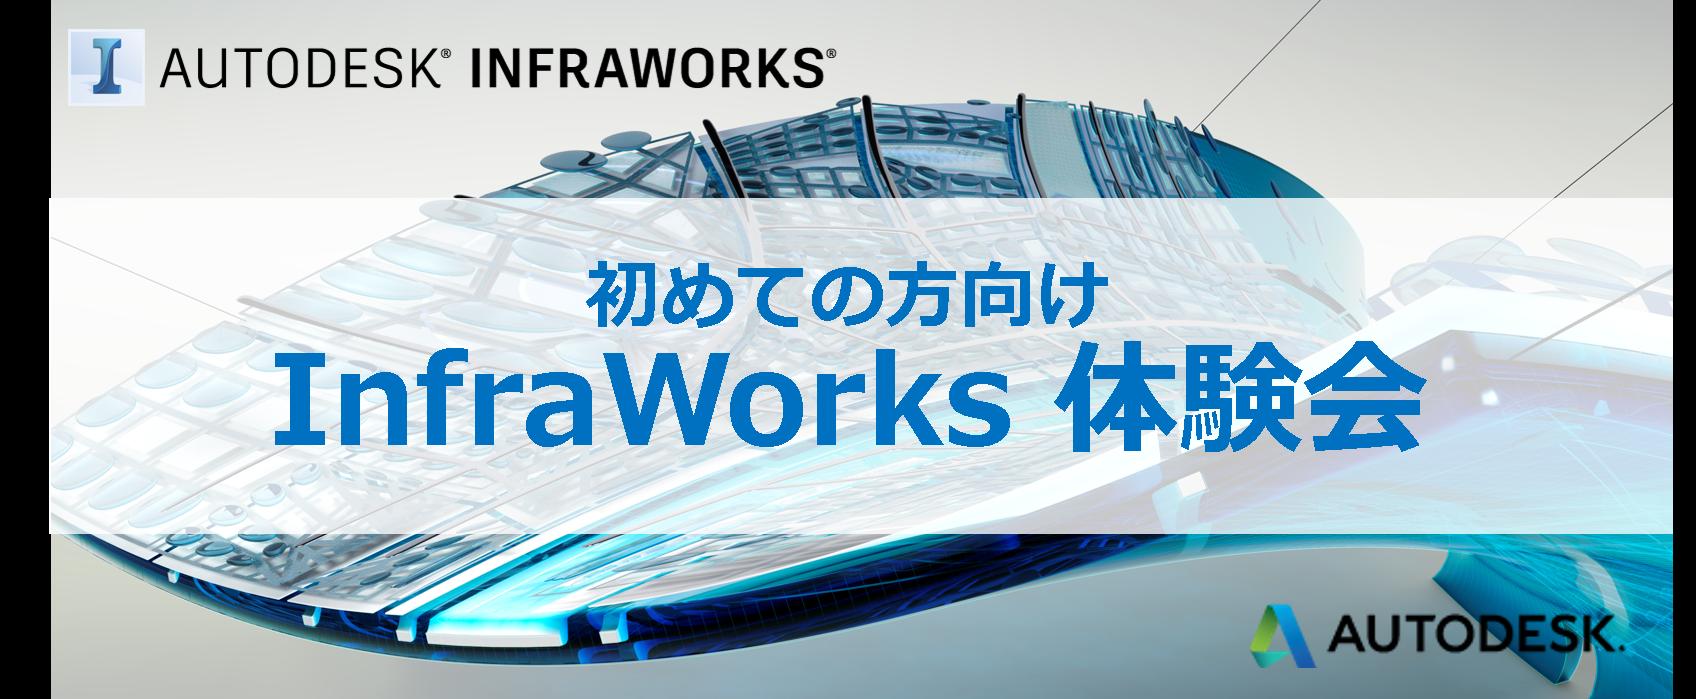 Autodesk InfraWorks 入門 無料体験会【東京】